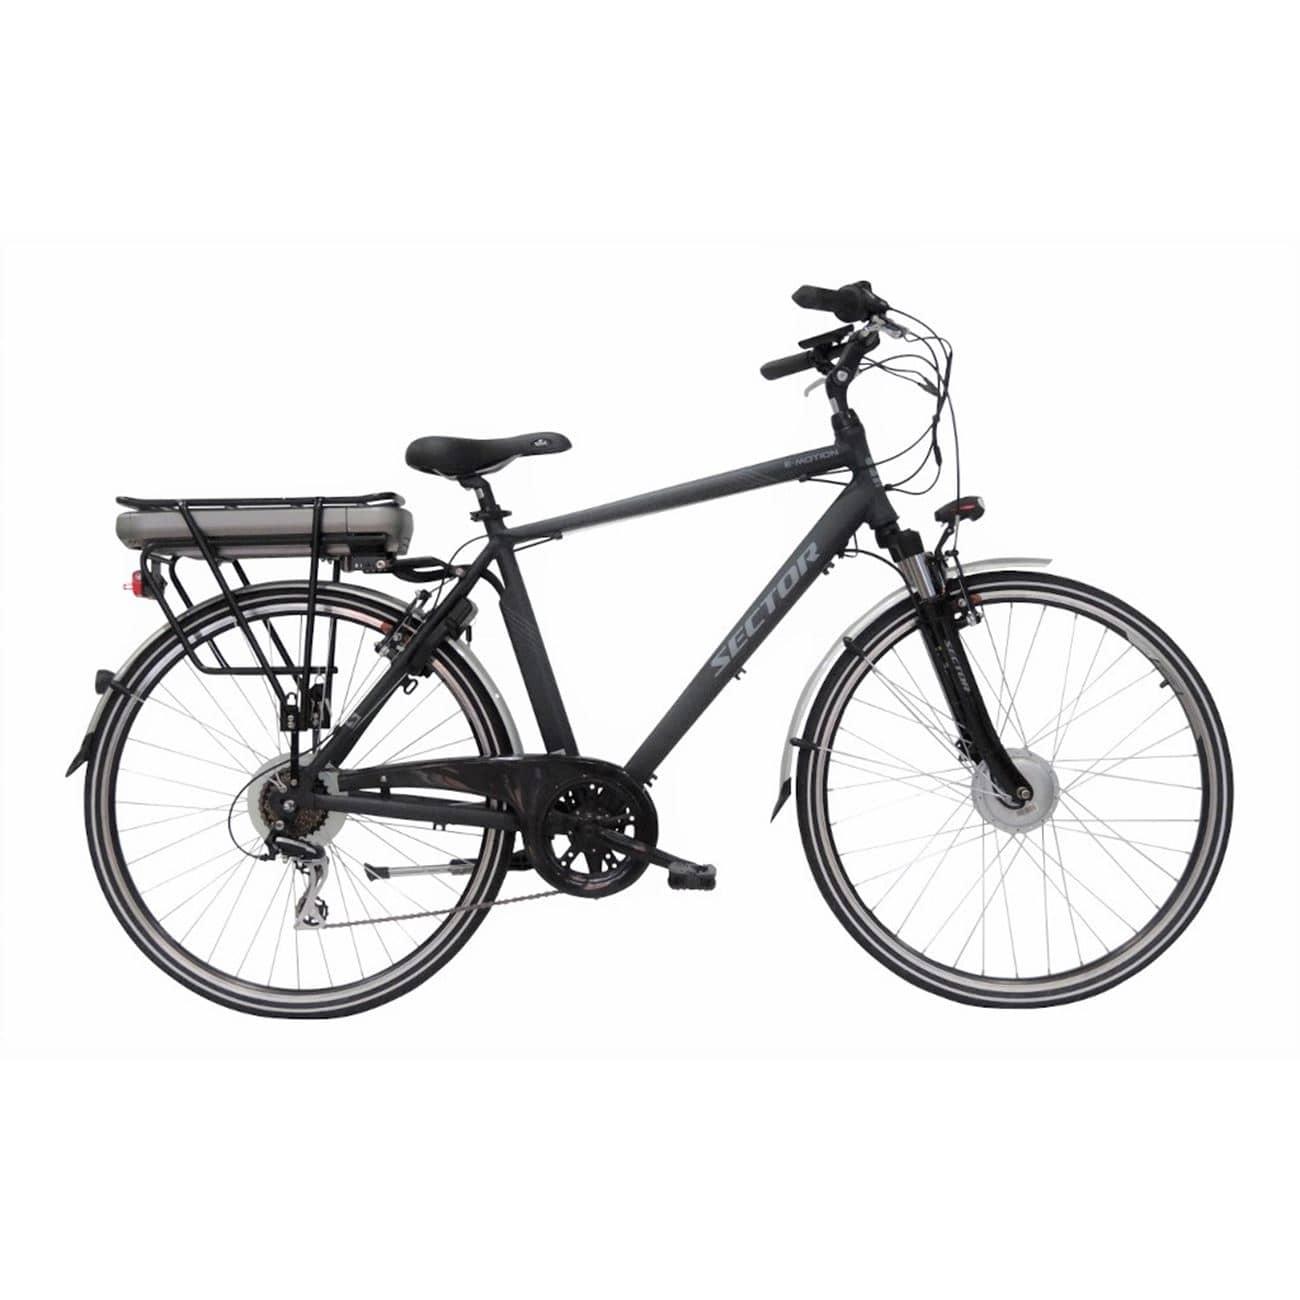 "Sector Ηλεκτρικό Ποδήλατο 28"" Αλουμινίου"